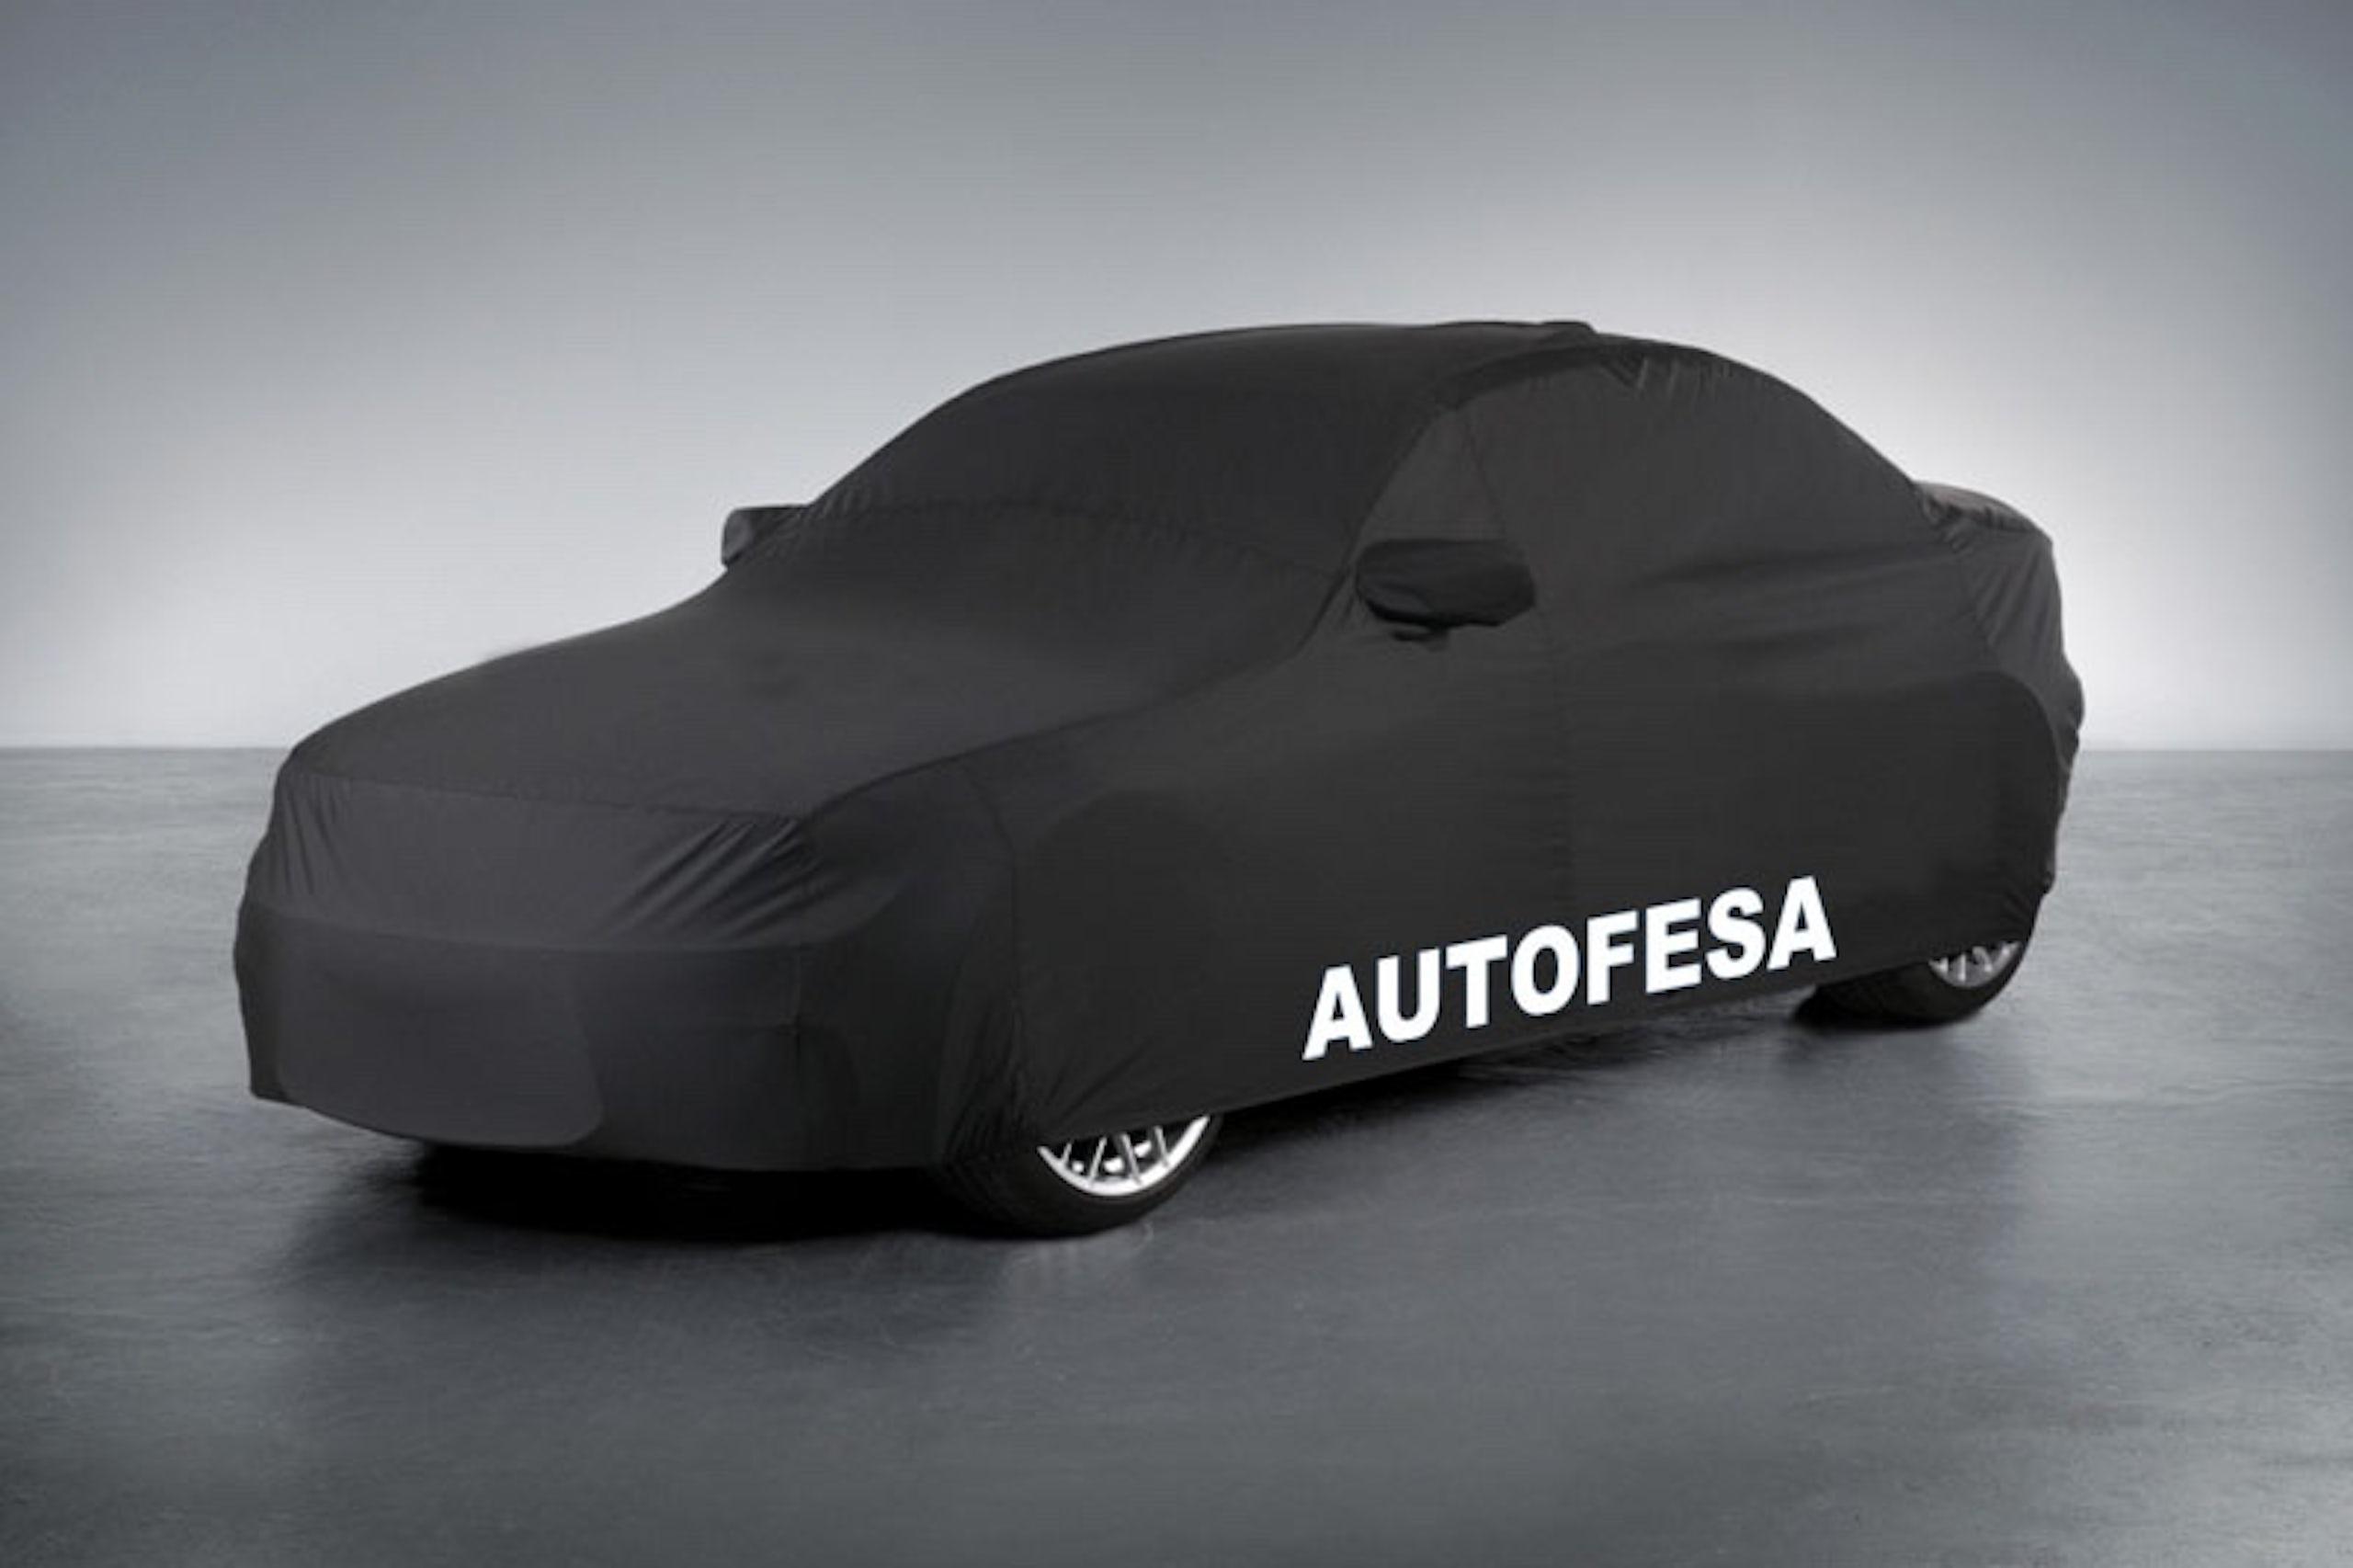 Lexus Nx 300h 300h 2.5 197cv Luxury 4WD 5p CVT Auto - Foto 28